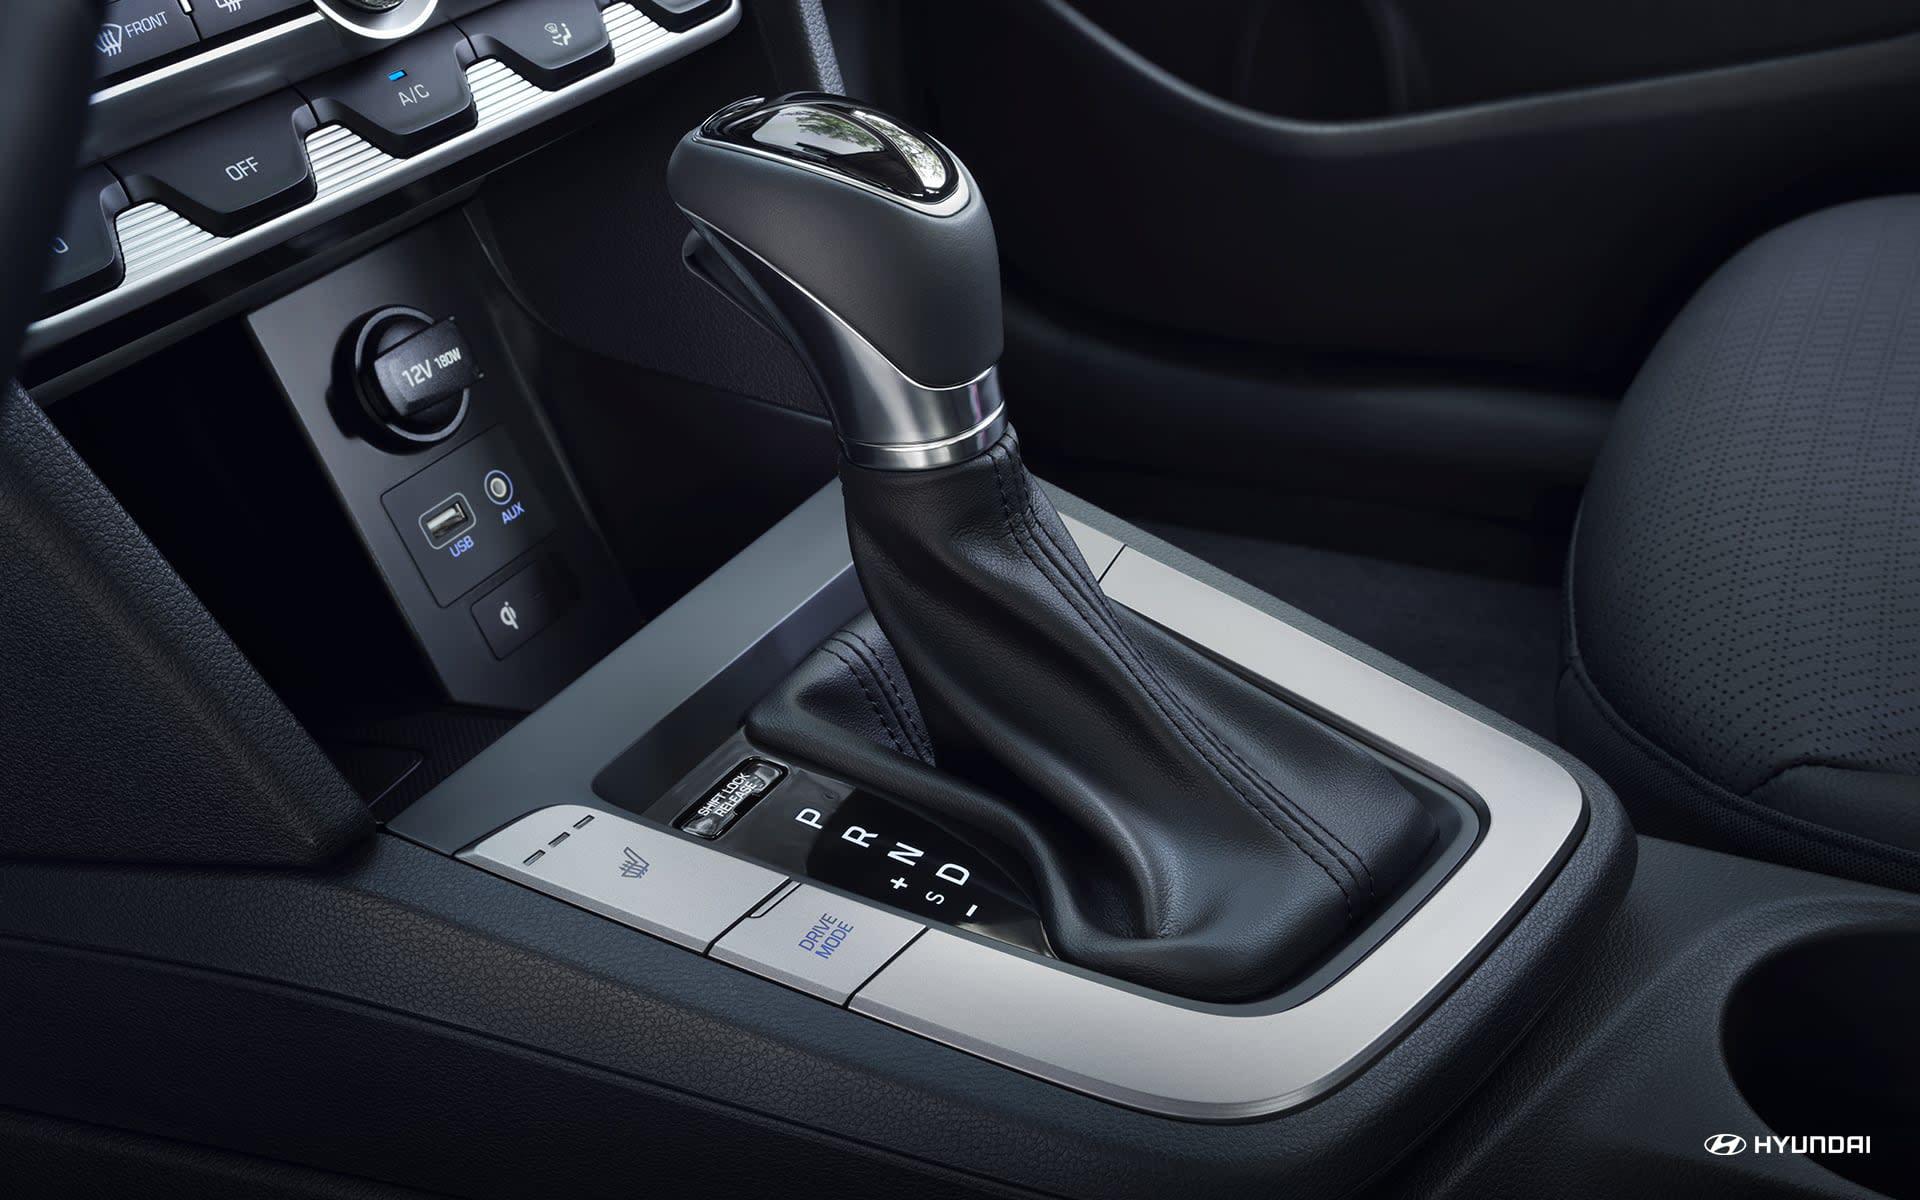 2020 Hyundai Elantra Gear Shifter